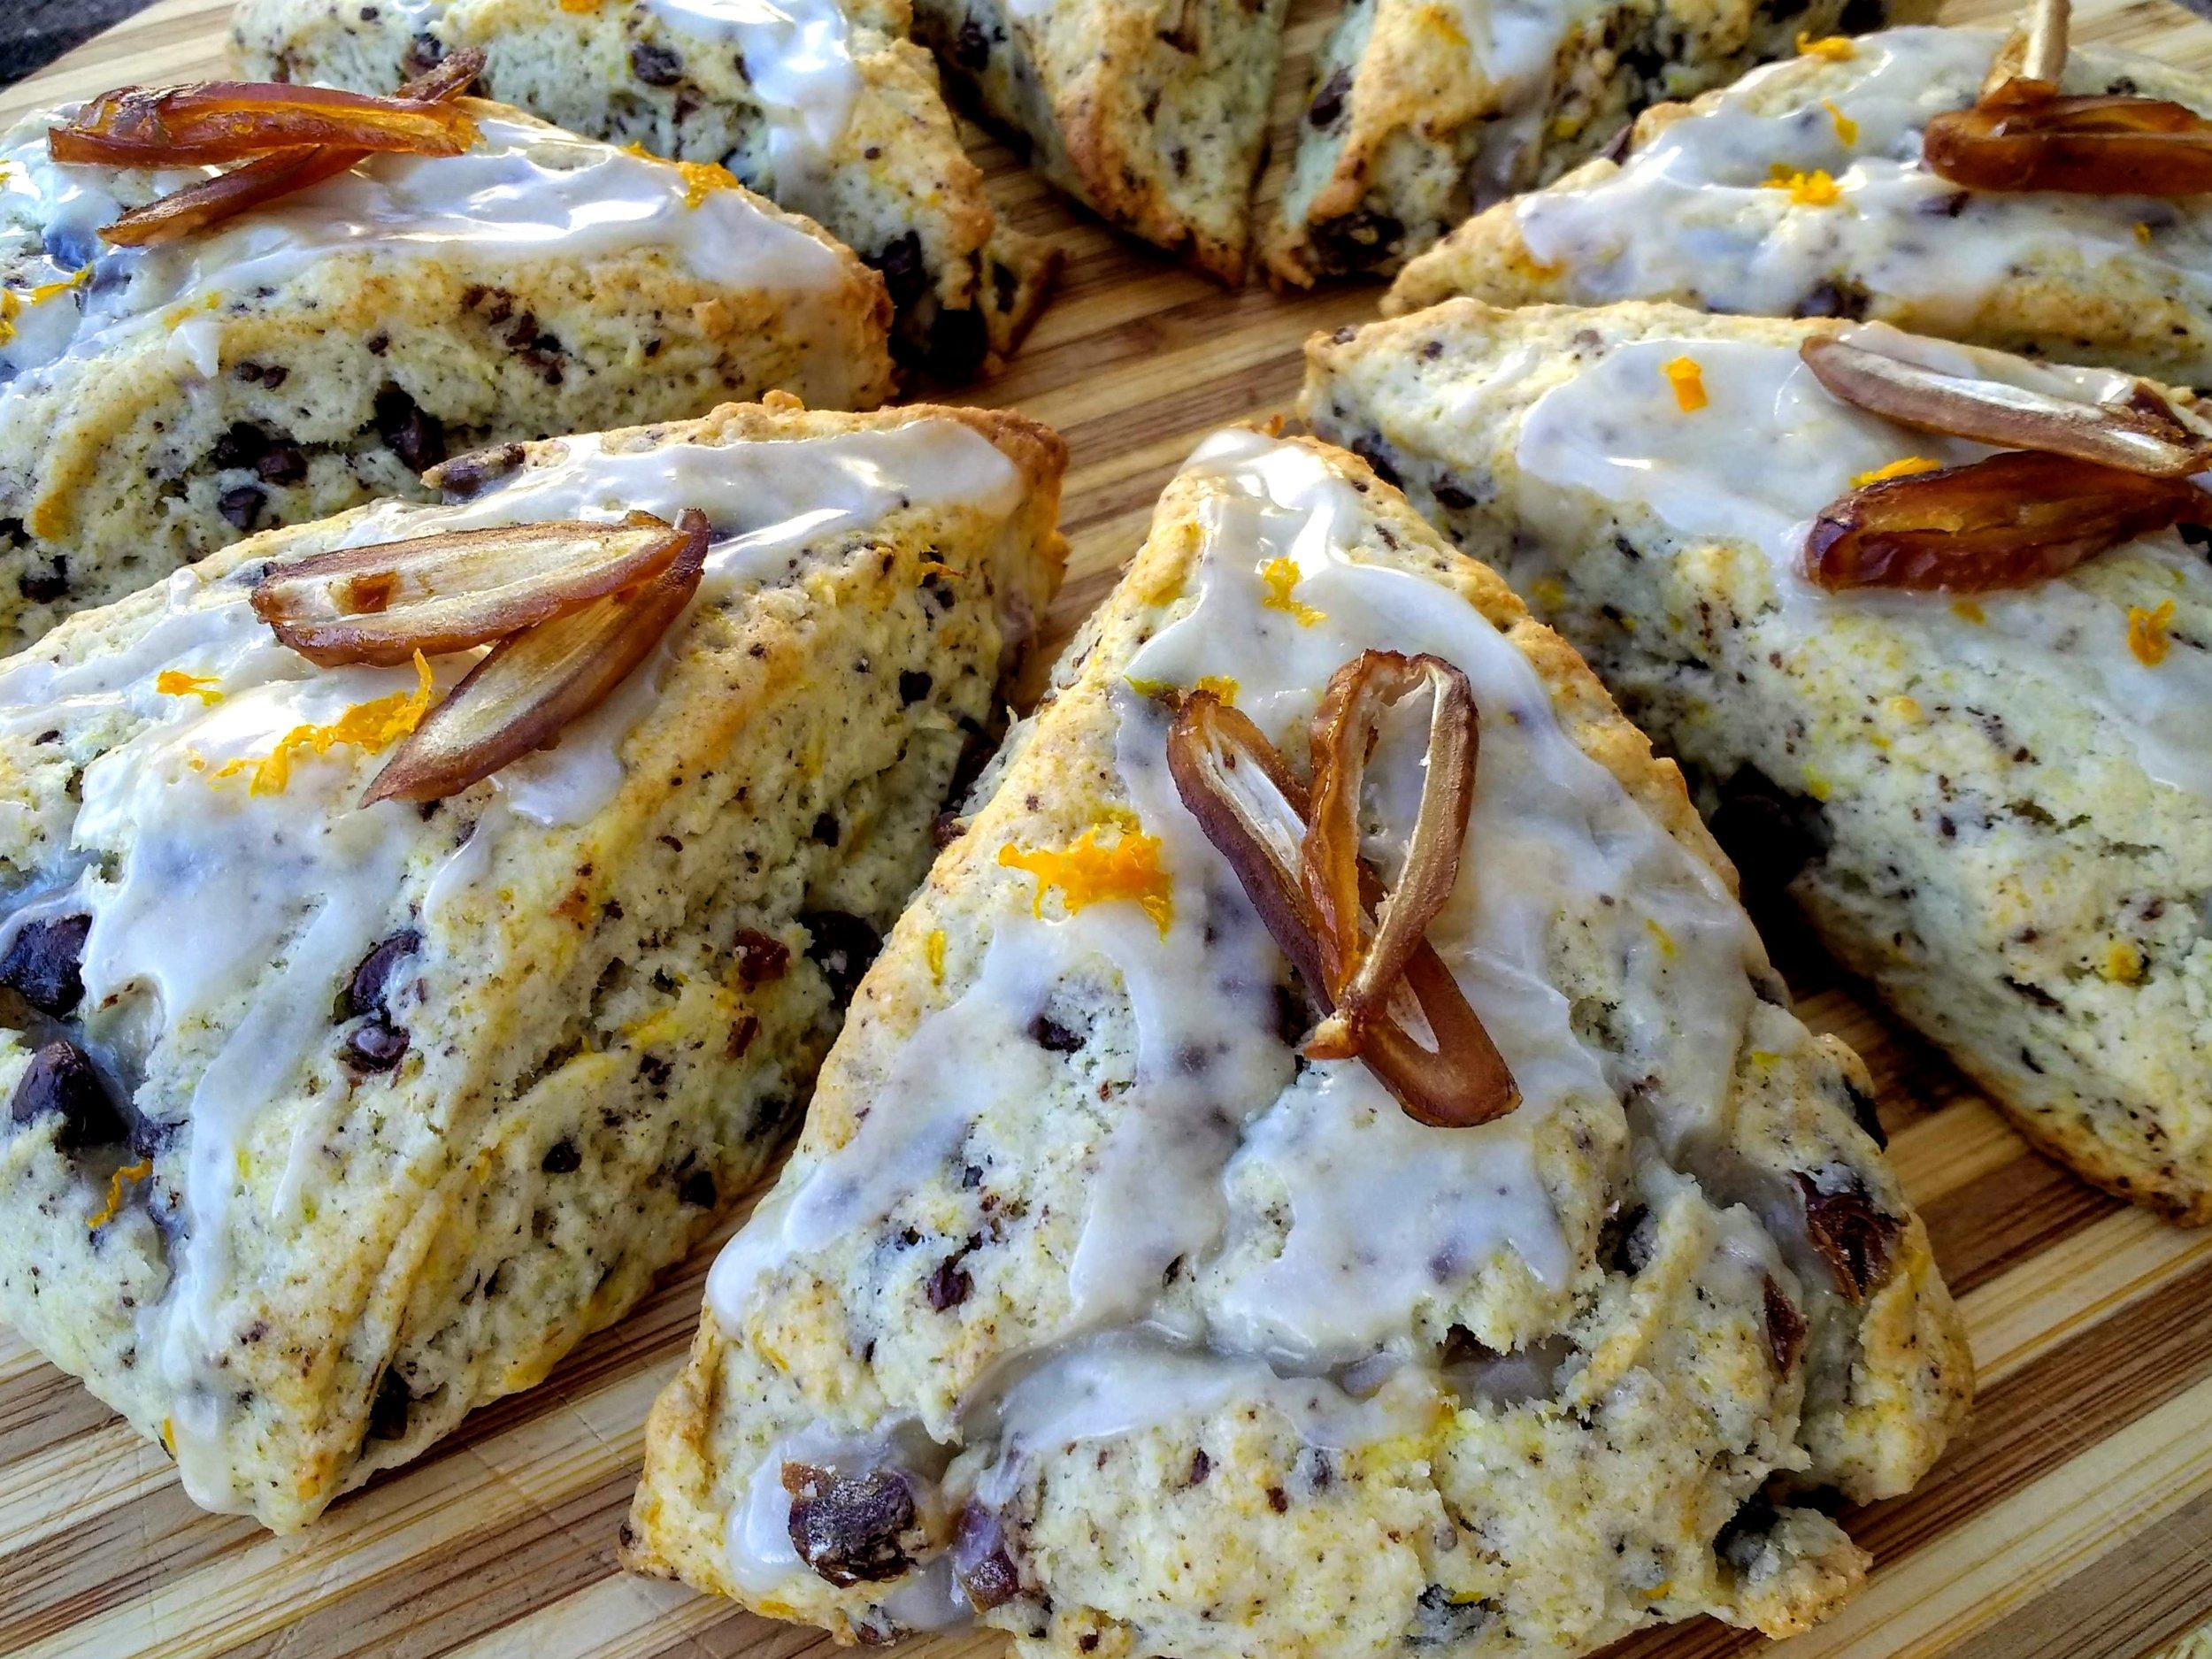 Breakfast week! Beneath the Crust: Chocolate, Orange and Date Scones